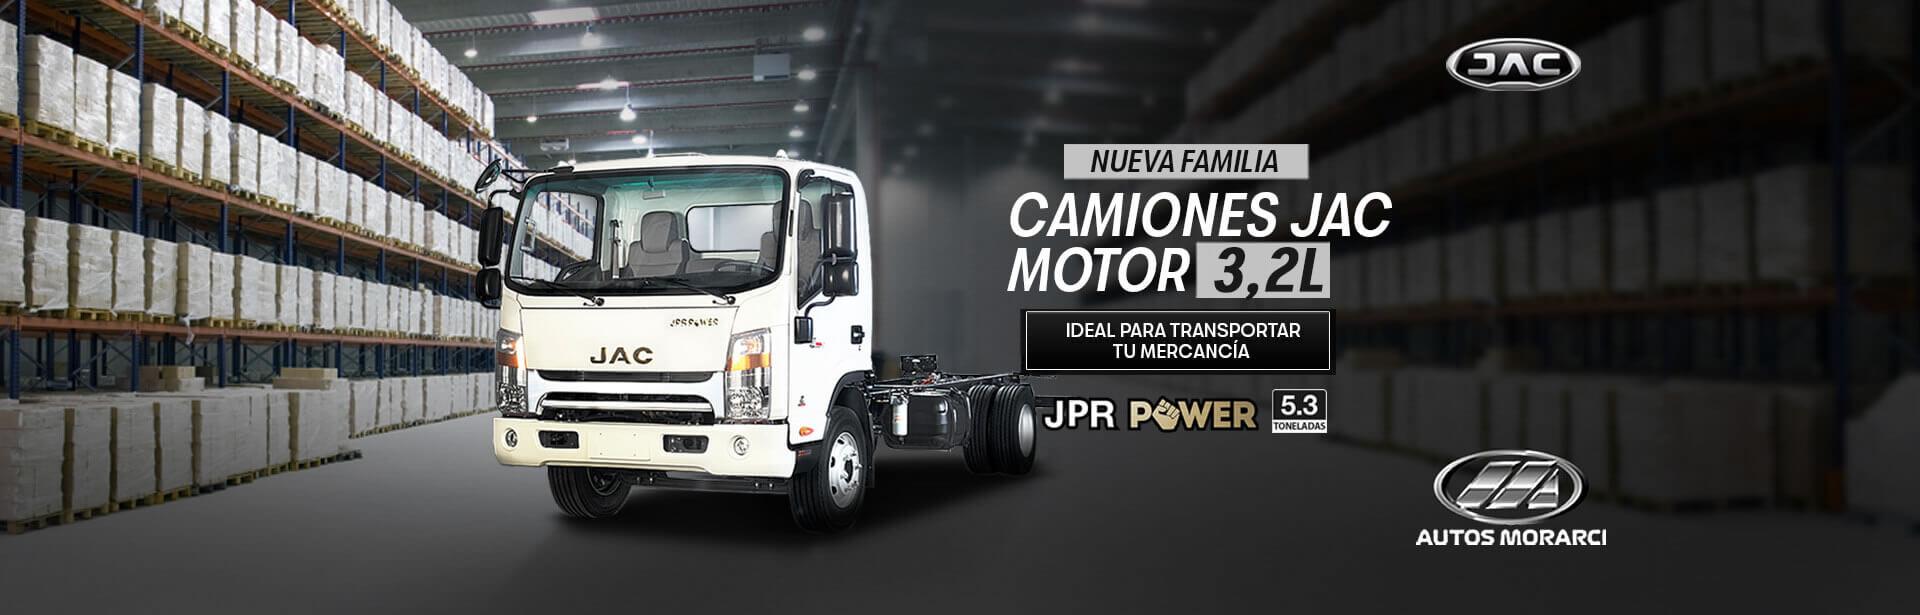 JPR MAX POWER